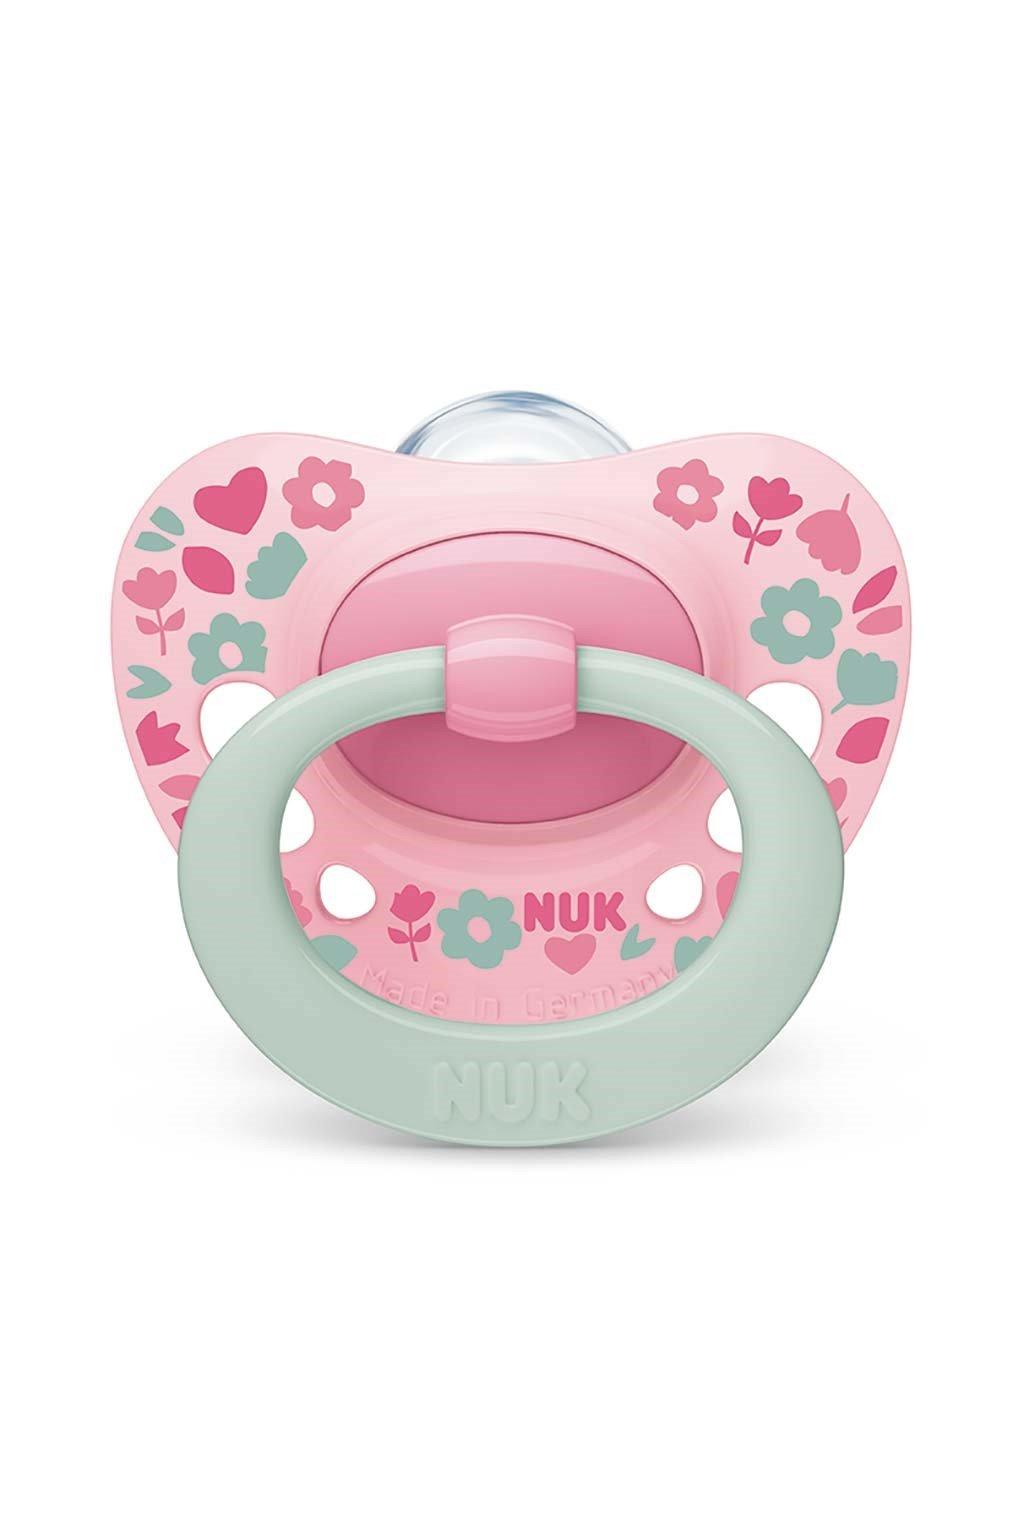 Dojčenský cumlík NUK Classic Signature 18-36m ružový